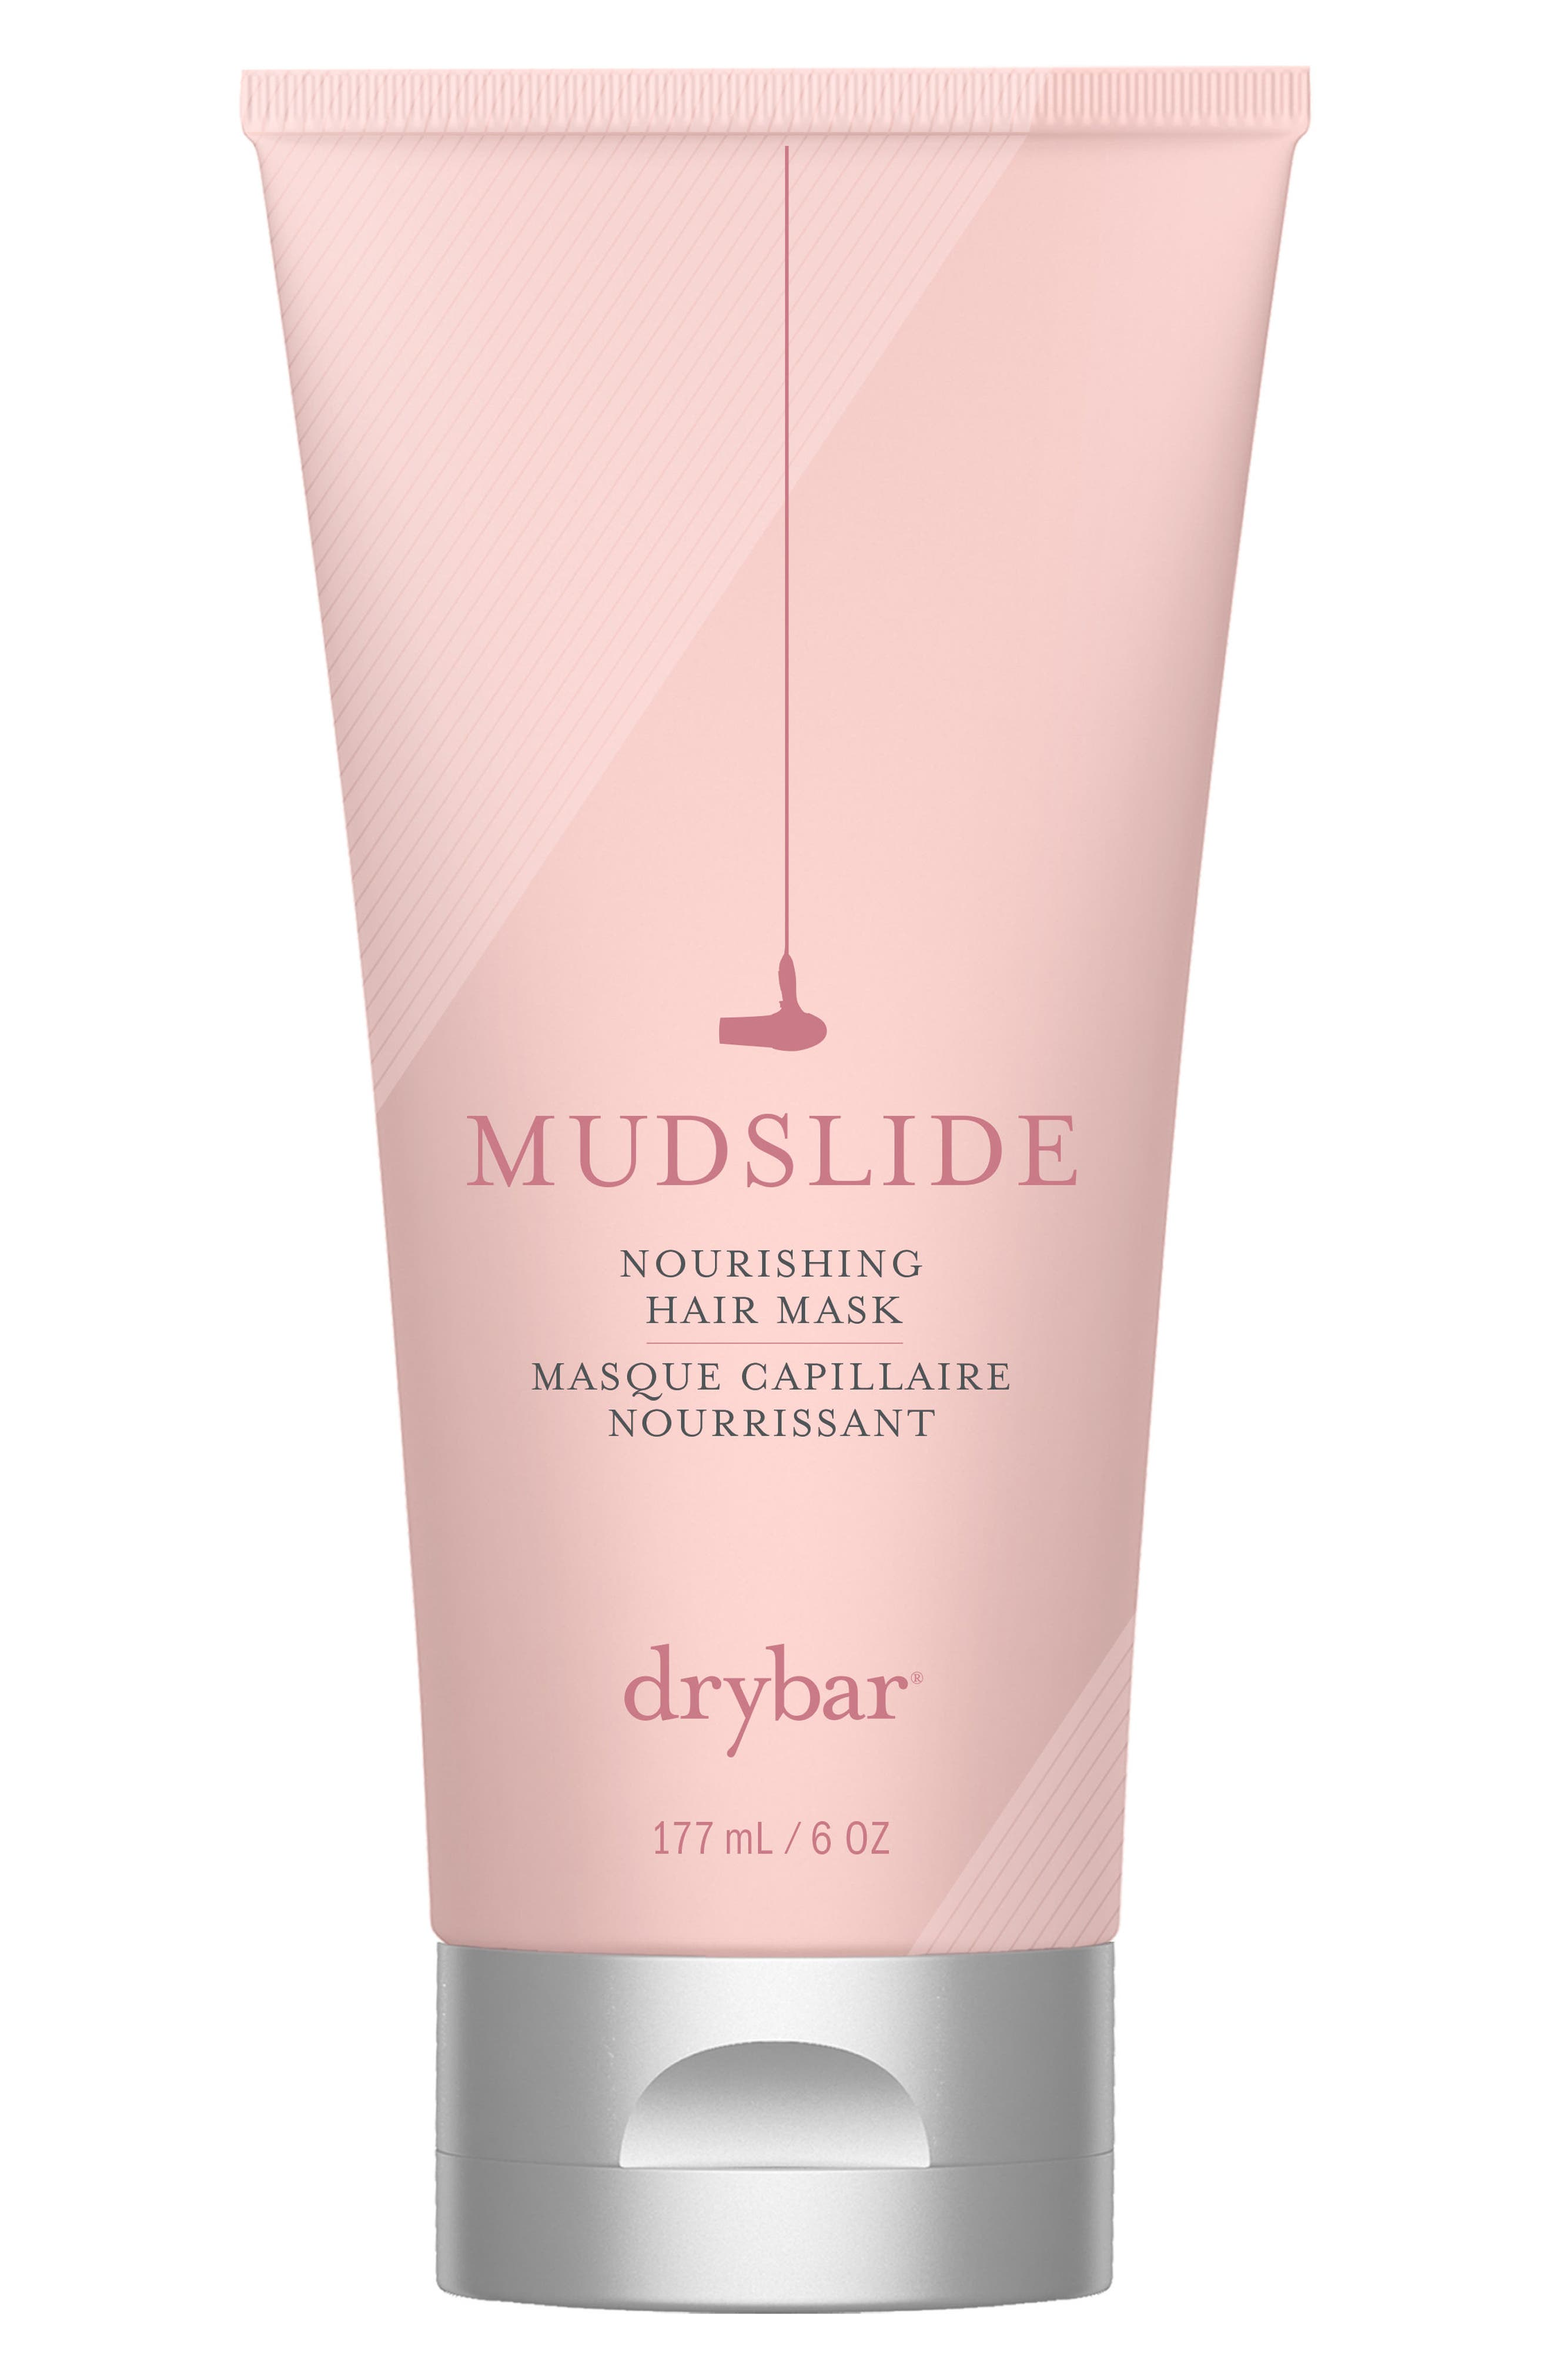 Mudslide Nourishing Hair Mask,                             Main thumbnail 1, color,                             No Color